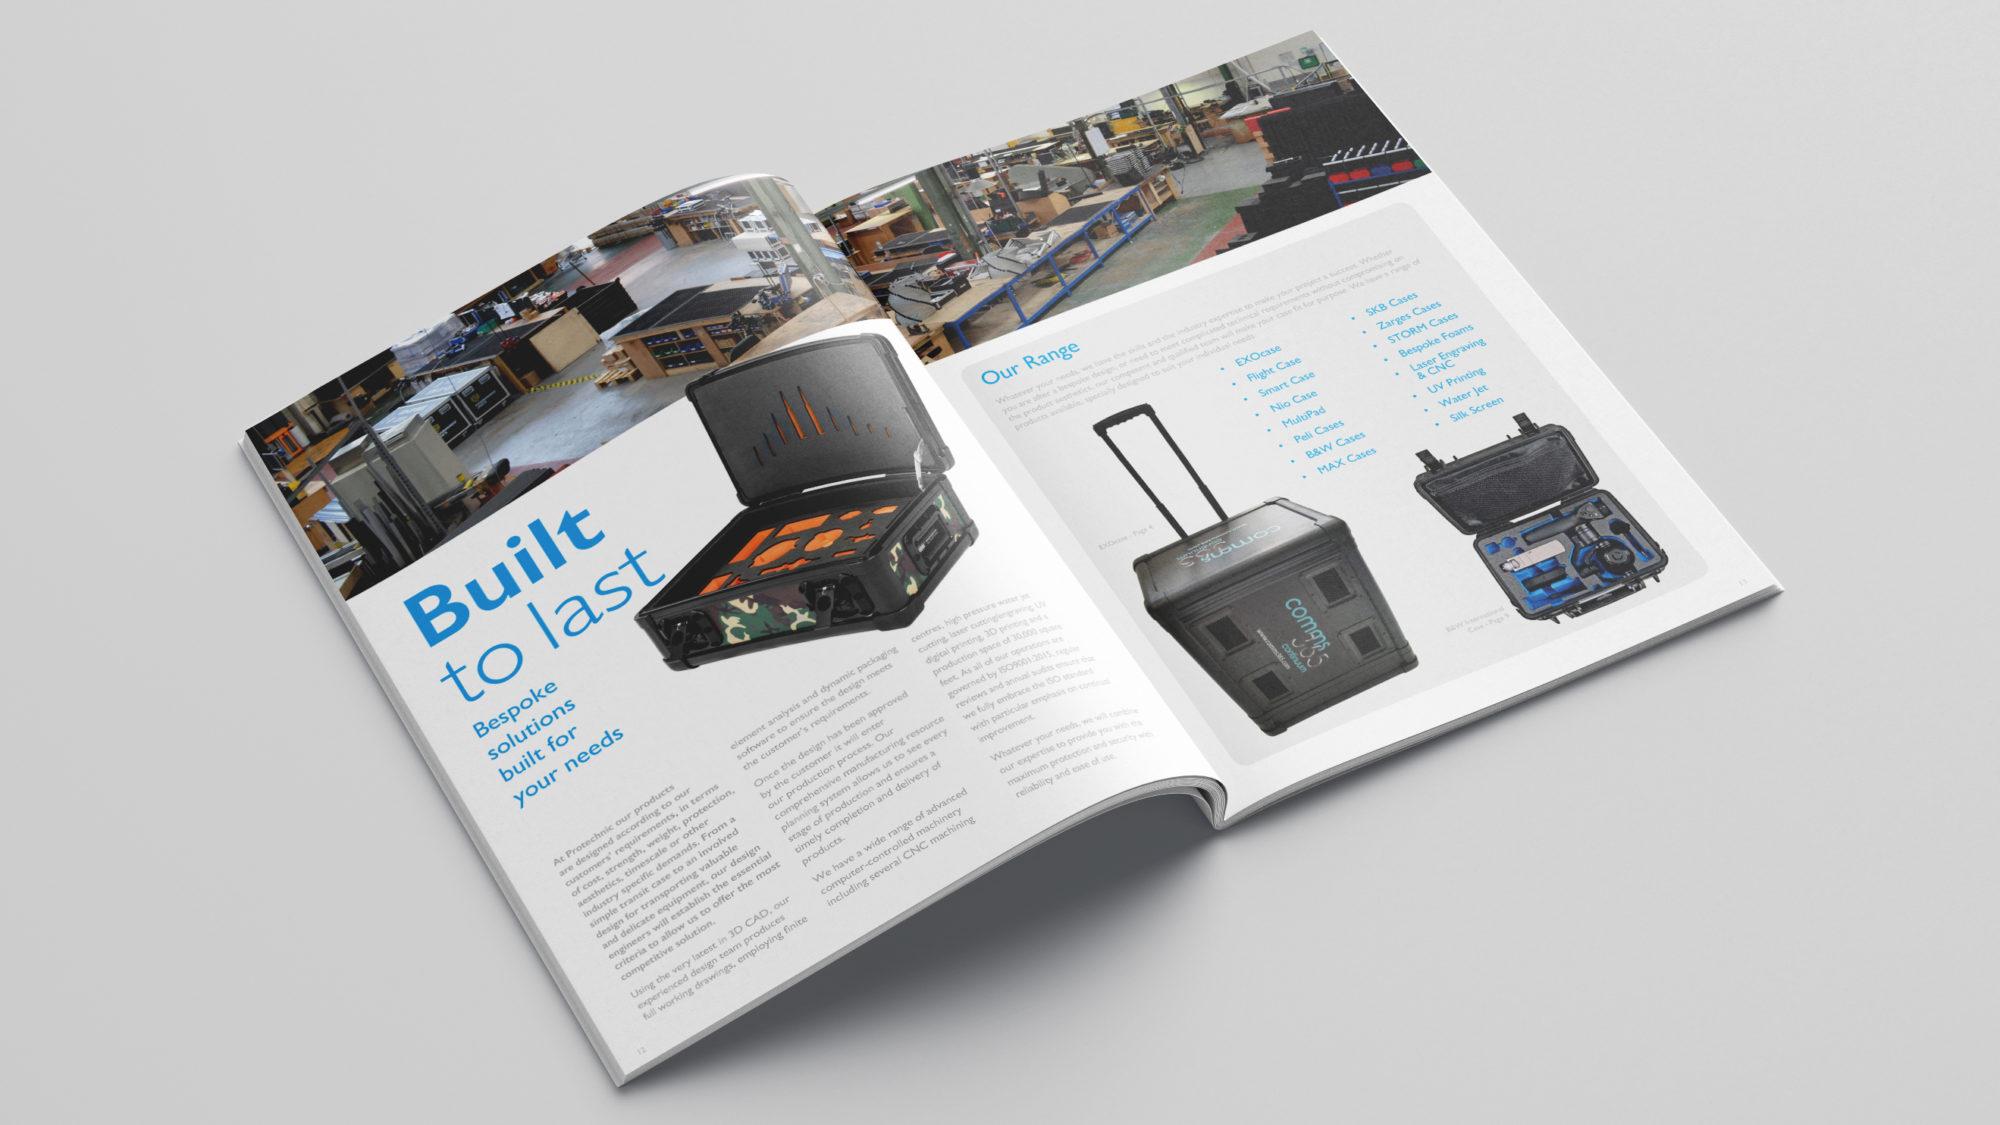 Protechnic Brochure 04 - Protechnic Brochure